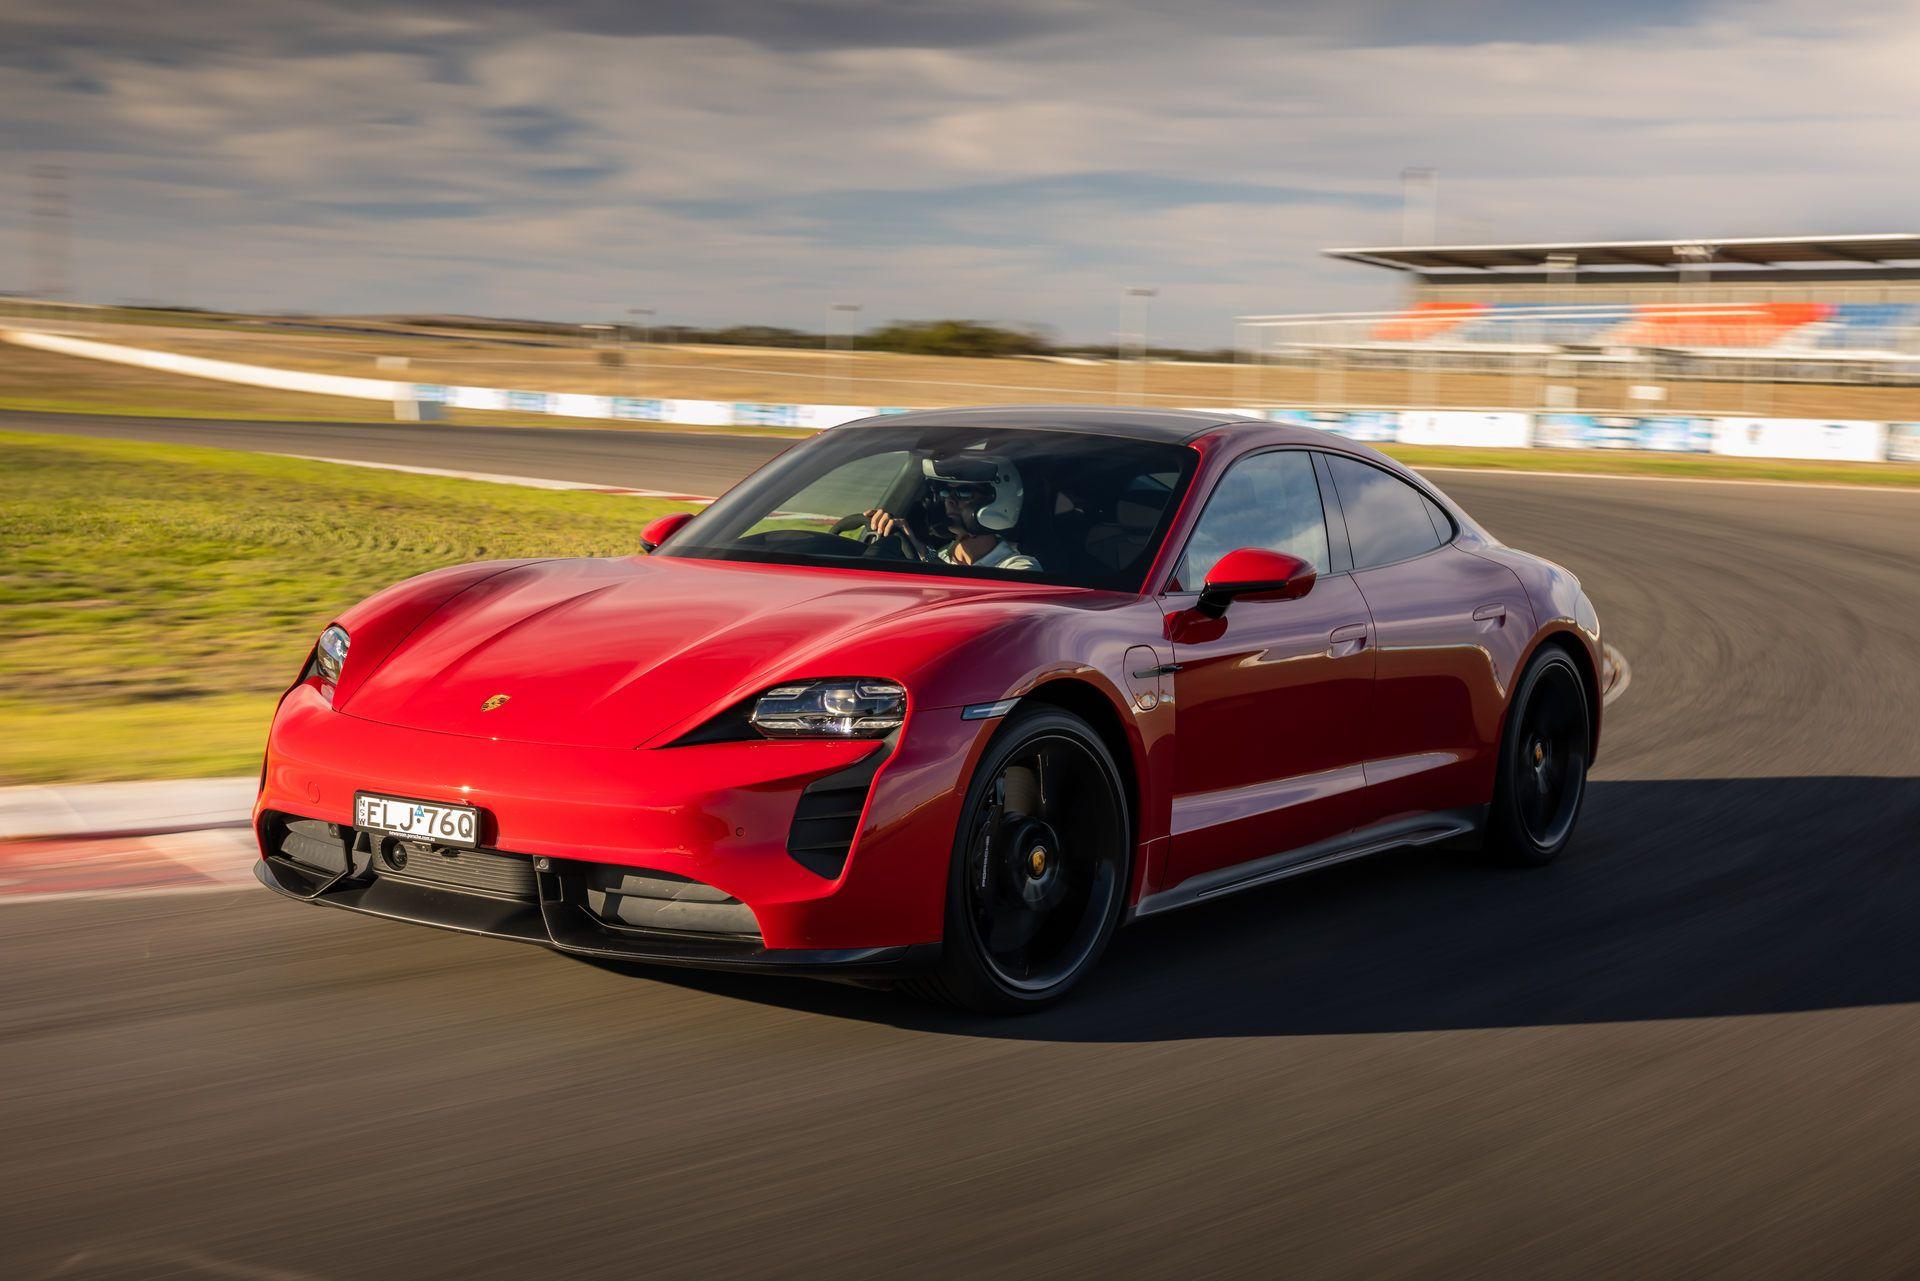 Porsche-Taycan-Turbo-S-The-Bend-Motorsport-Park-27